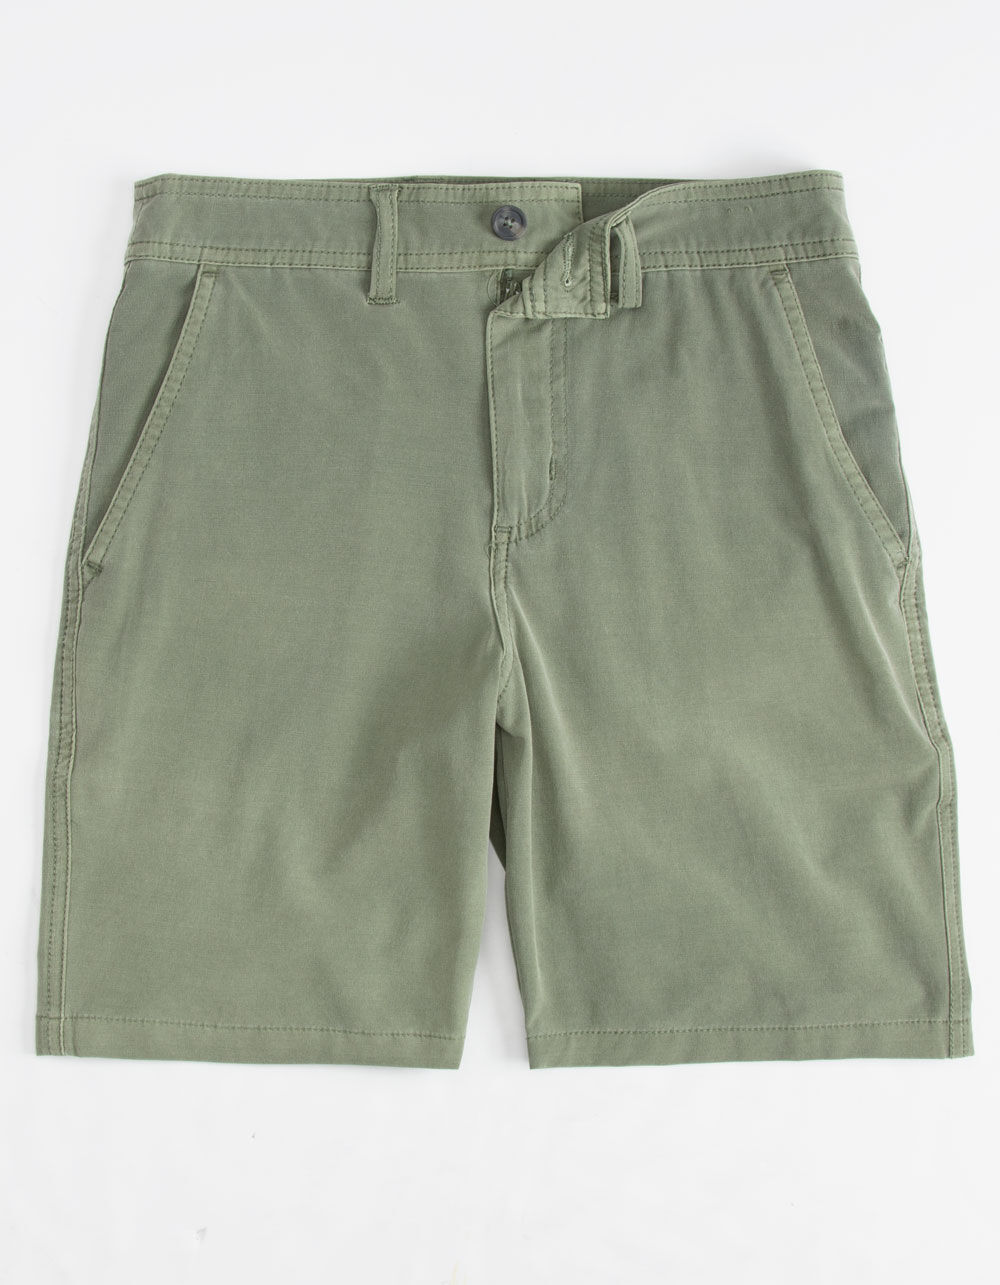 VALOR Pigment Dyed Olive Boys Hybrid Shorts